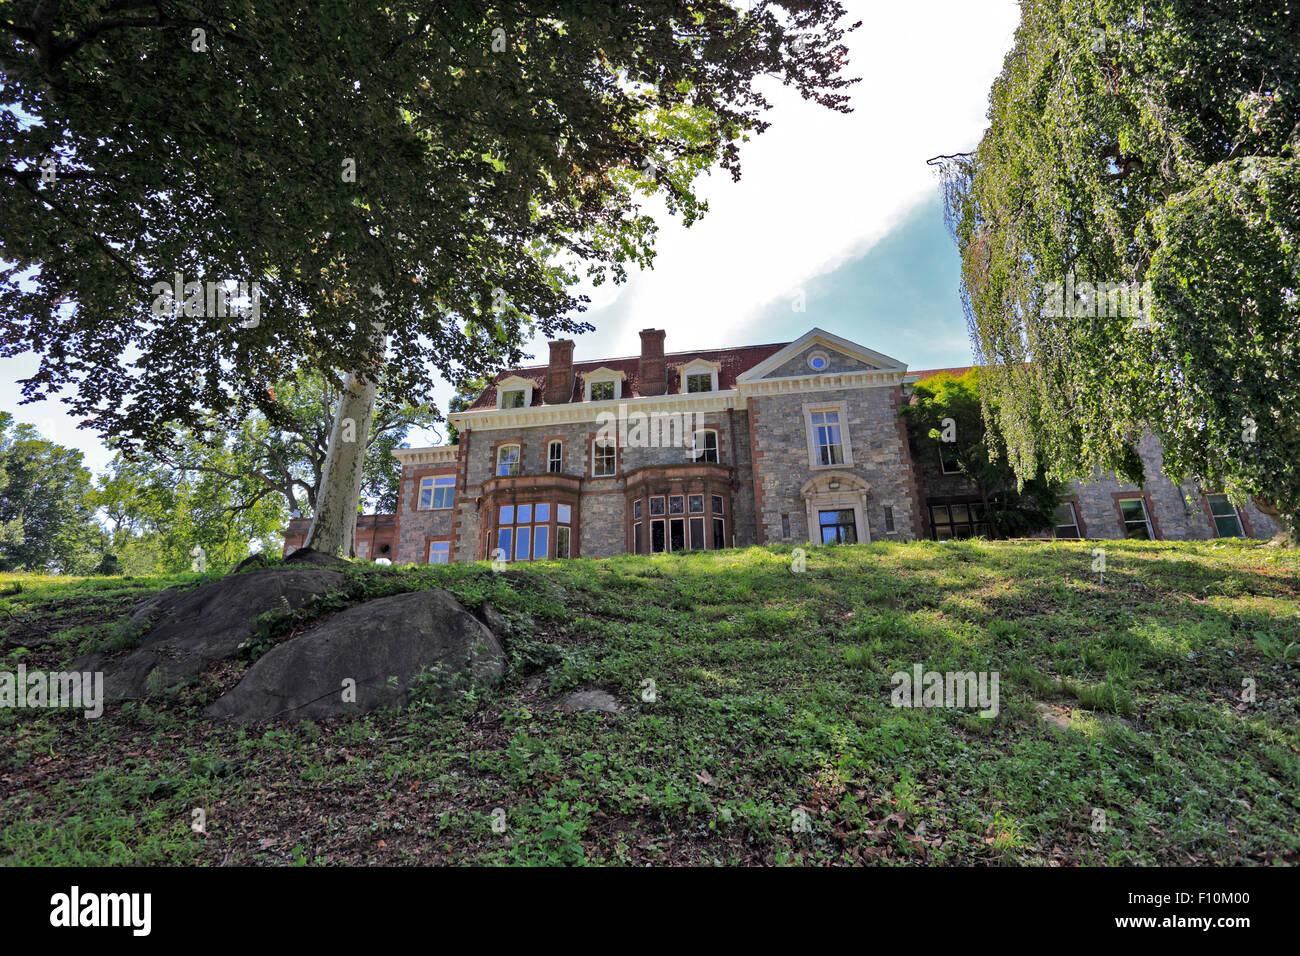 Lenoir Mansion Yonkers New York - Stock Image